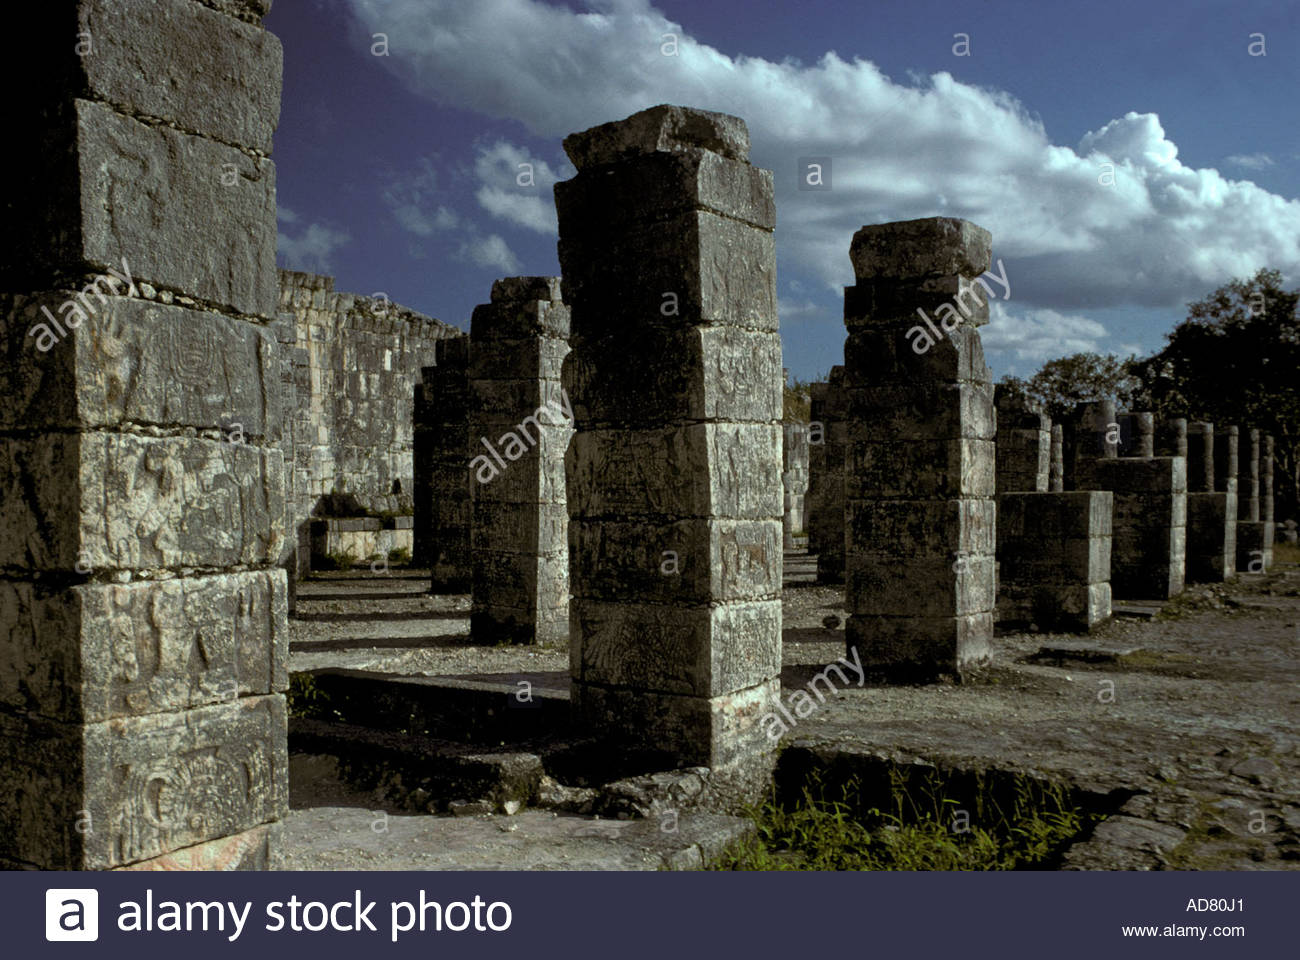 MEXICO Yucatan State, Chichen Itza, post-classic Maya culture, detail of the Temple of the 1000 columns;1000-1200 A.E. - Stock Image